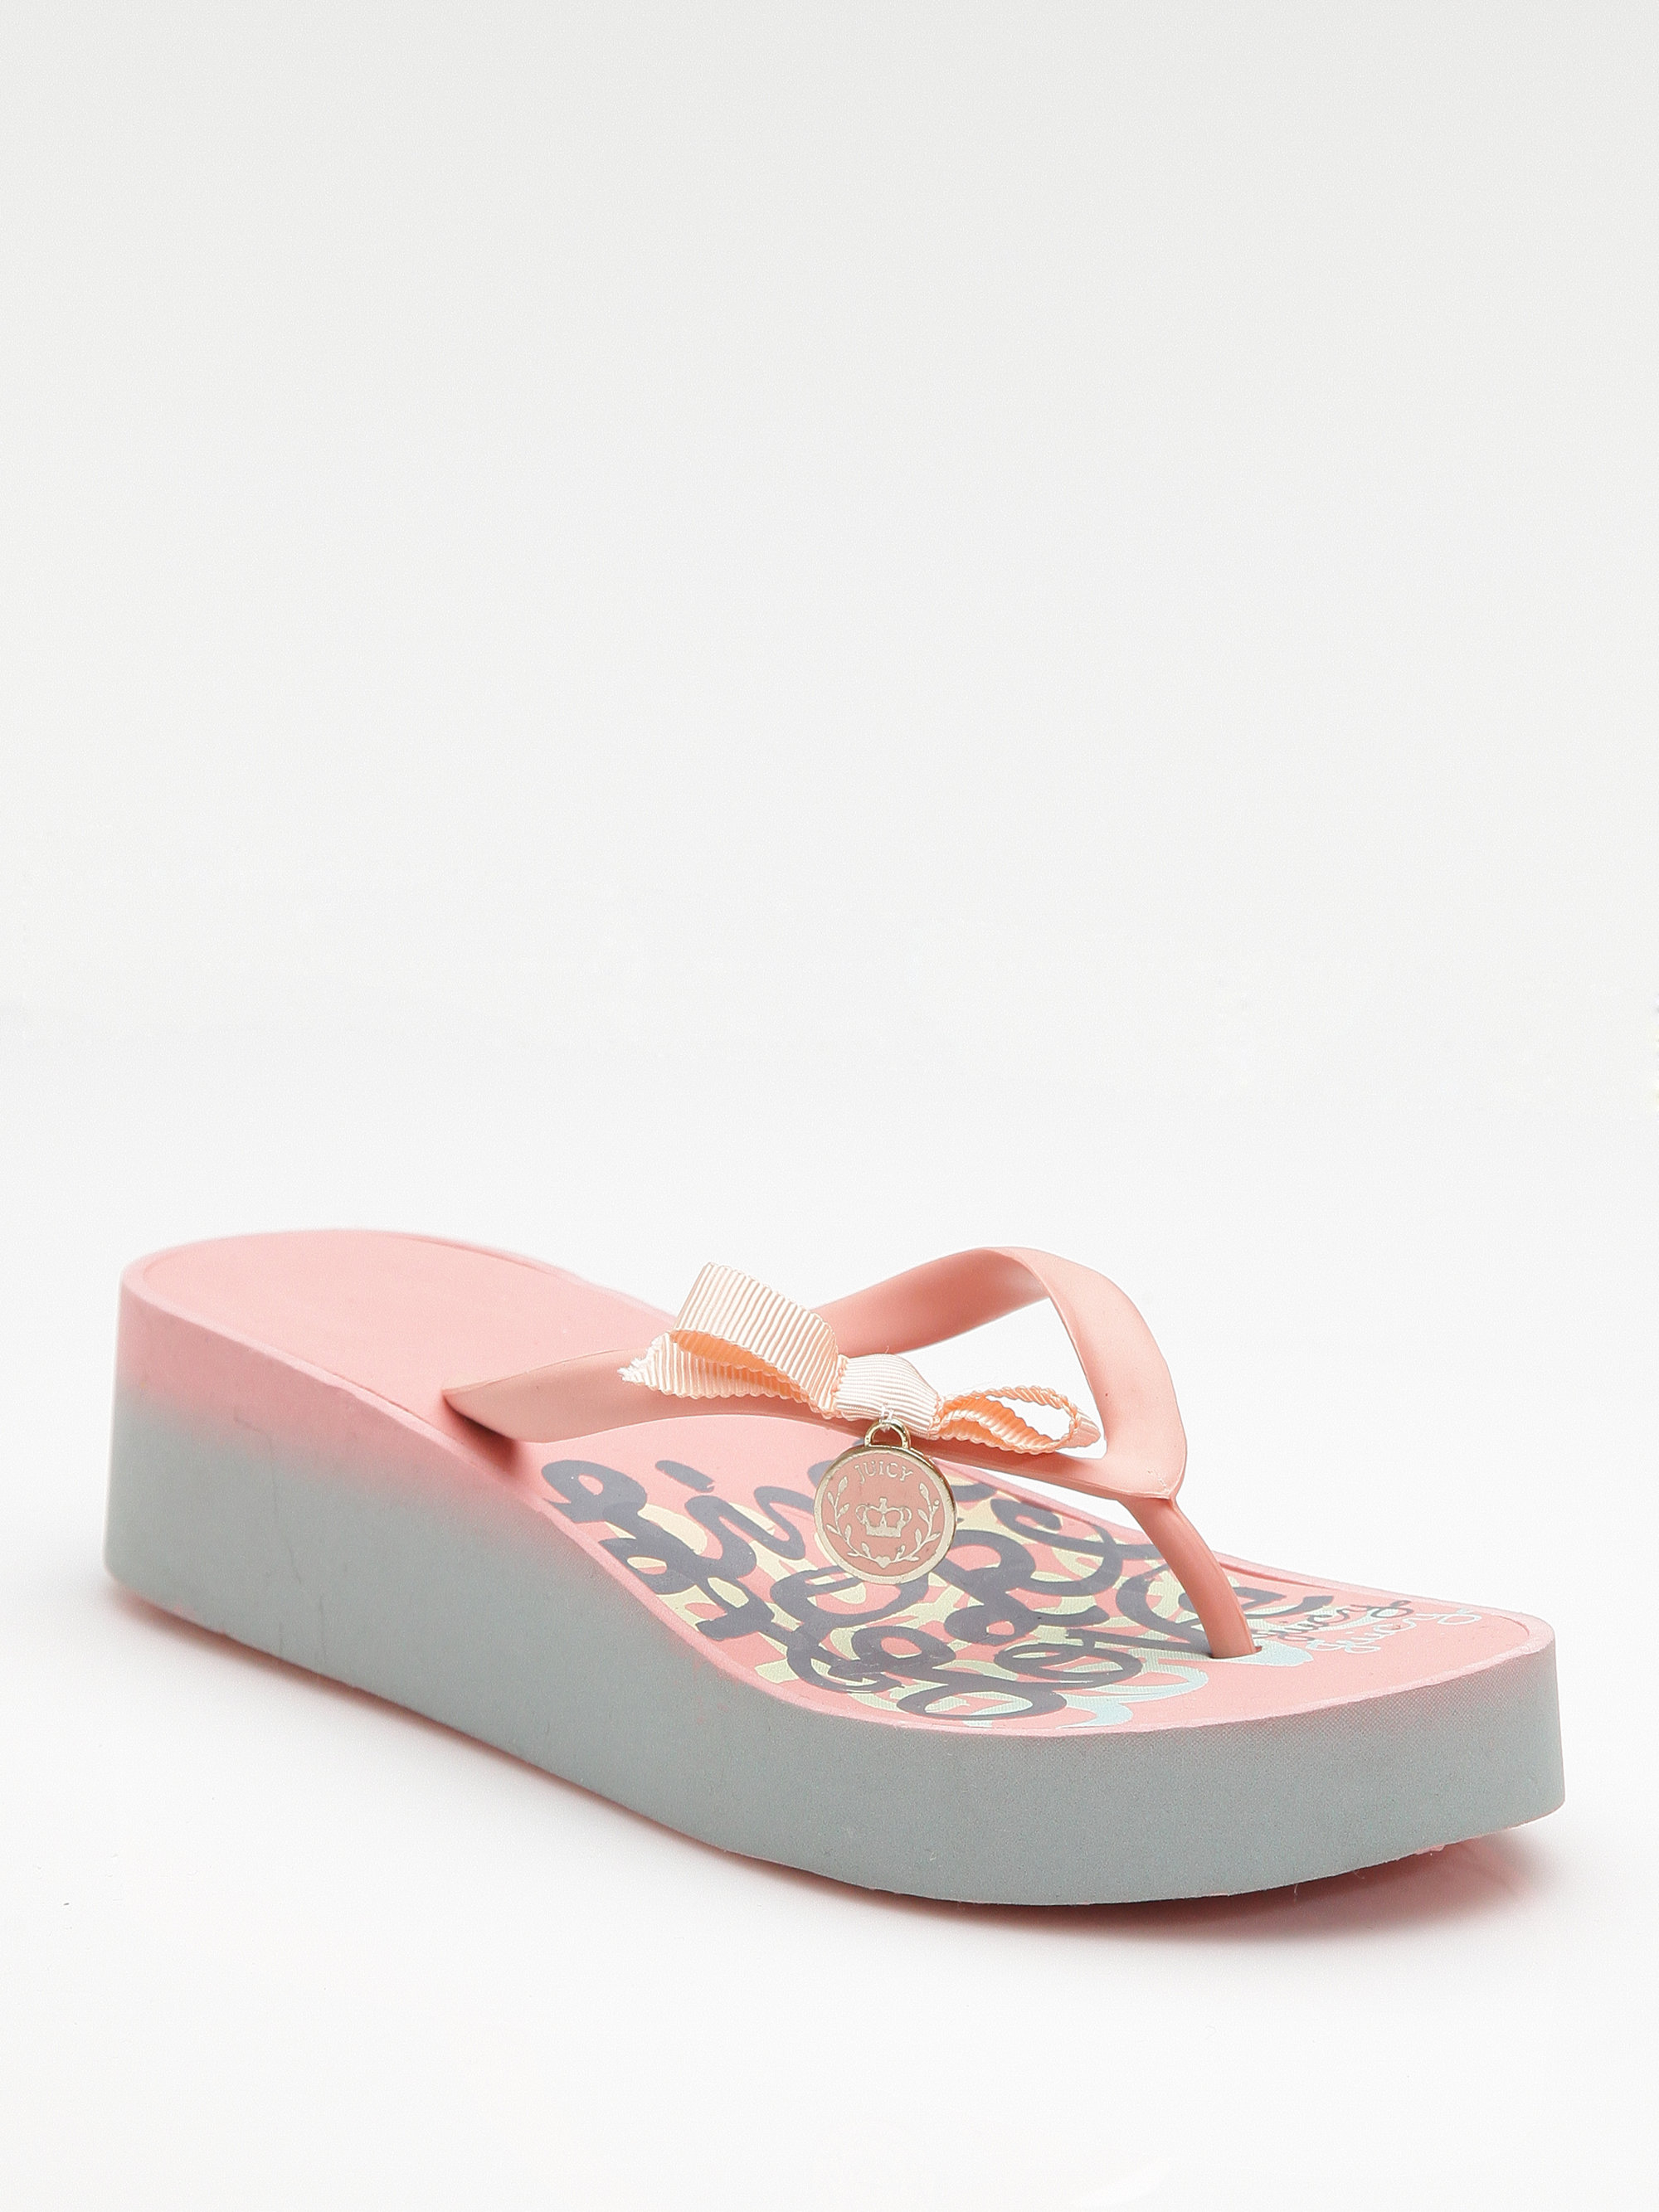 Lyst Juicy Couture Rubber Platform Flip Flops In Brown